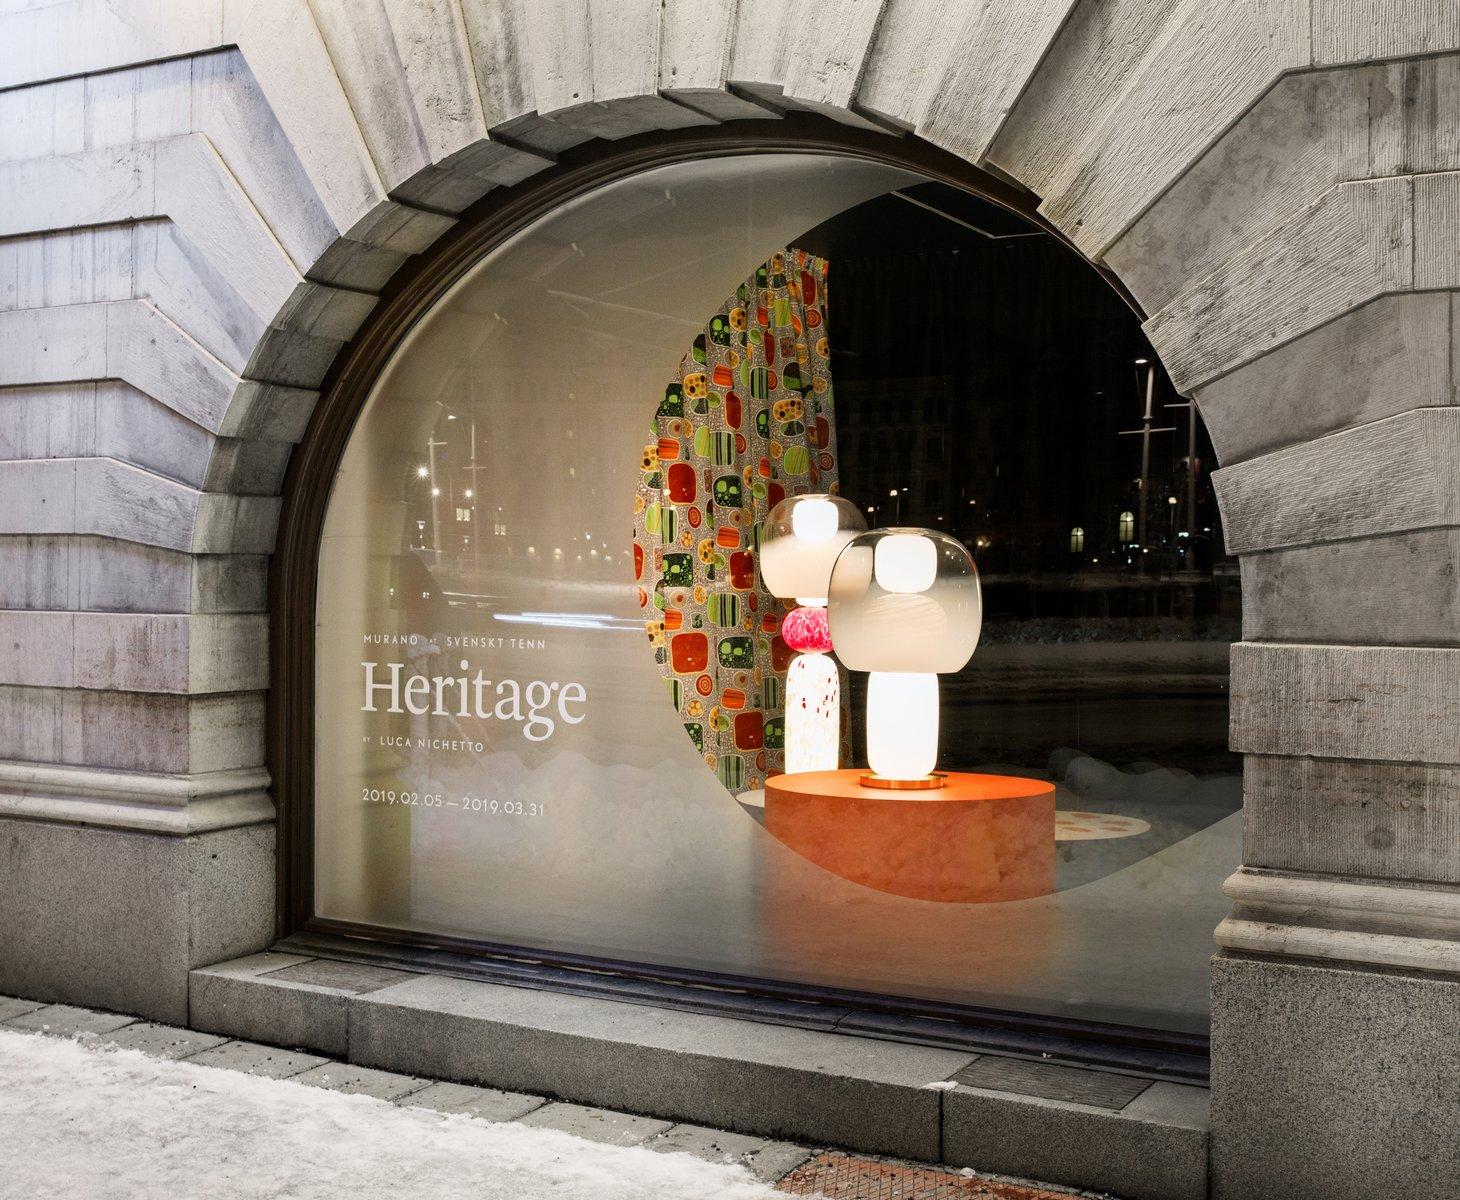 Design-by-Josef-Franck-in-glass- interpretation-Design-by-Josef-Franck-in-glass- interpretation-04